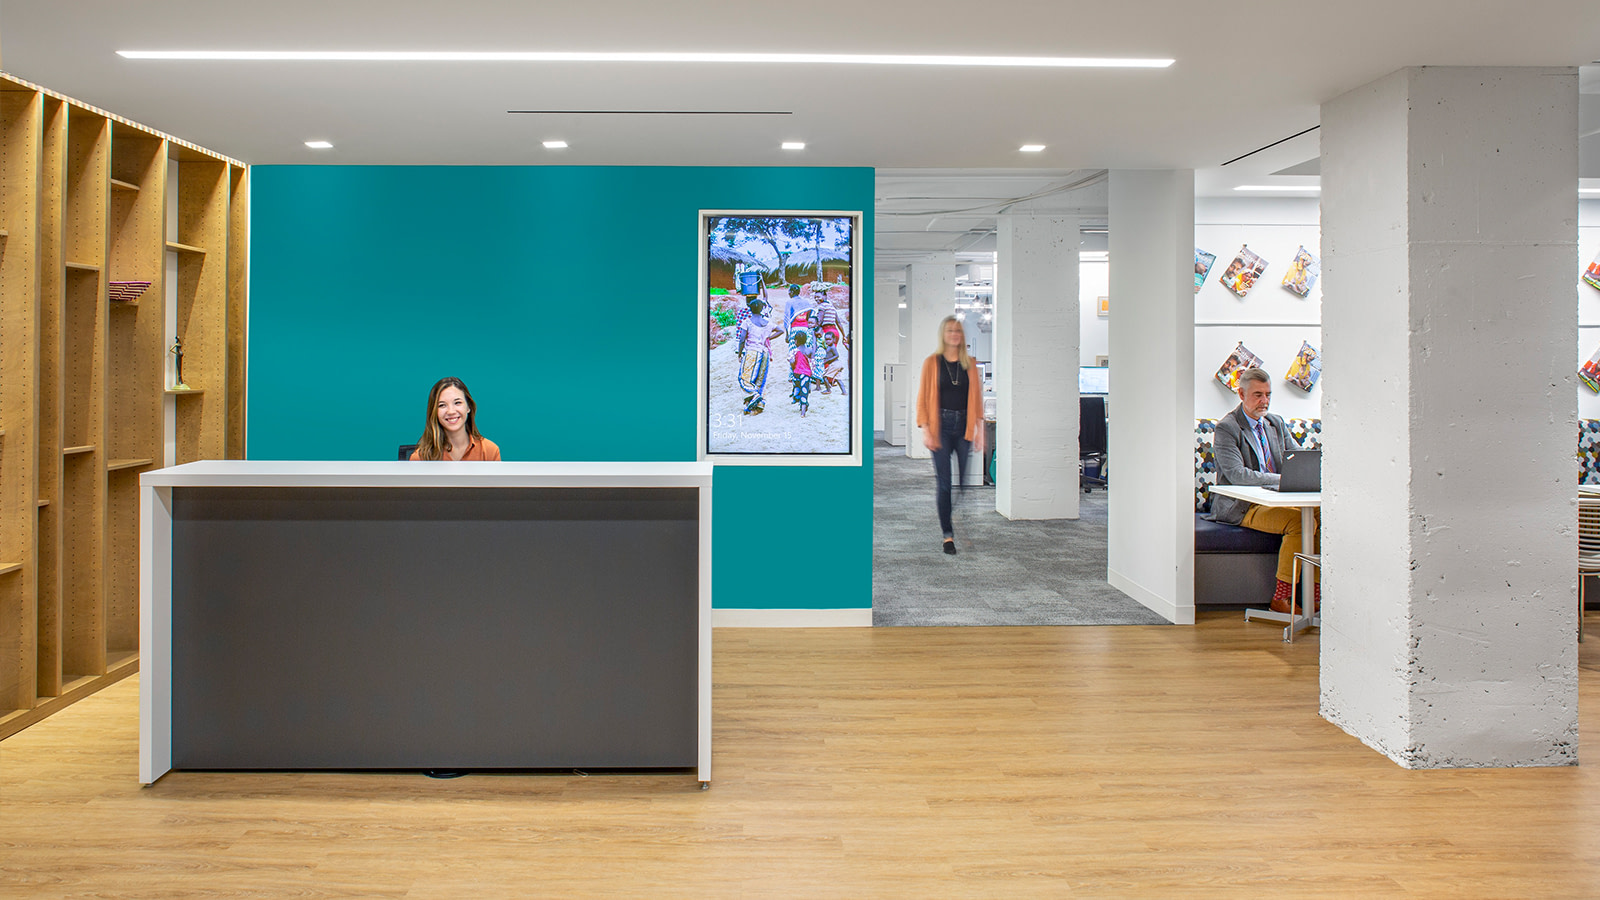 Reception area at a DC non-profit